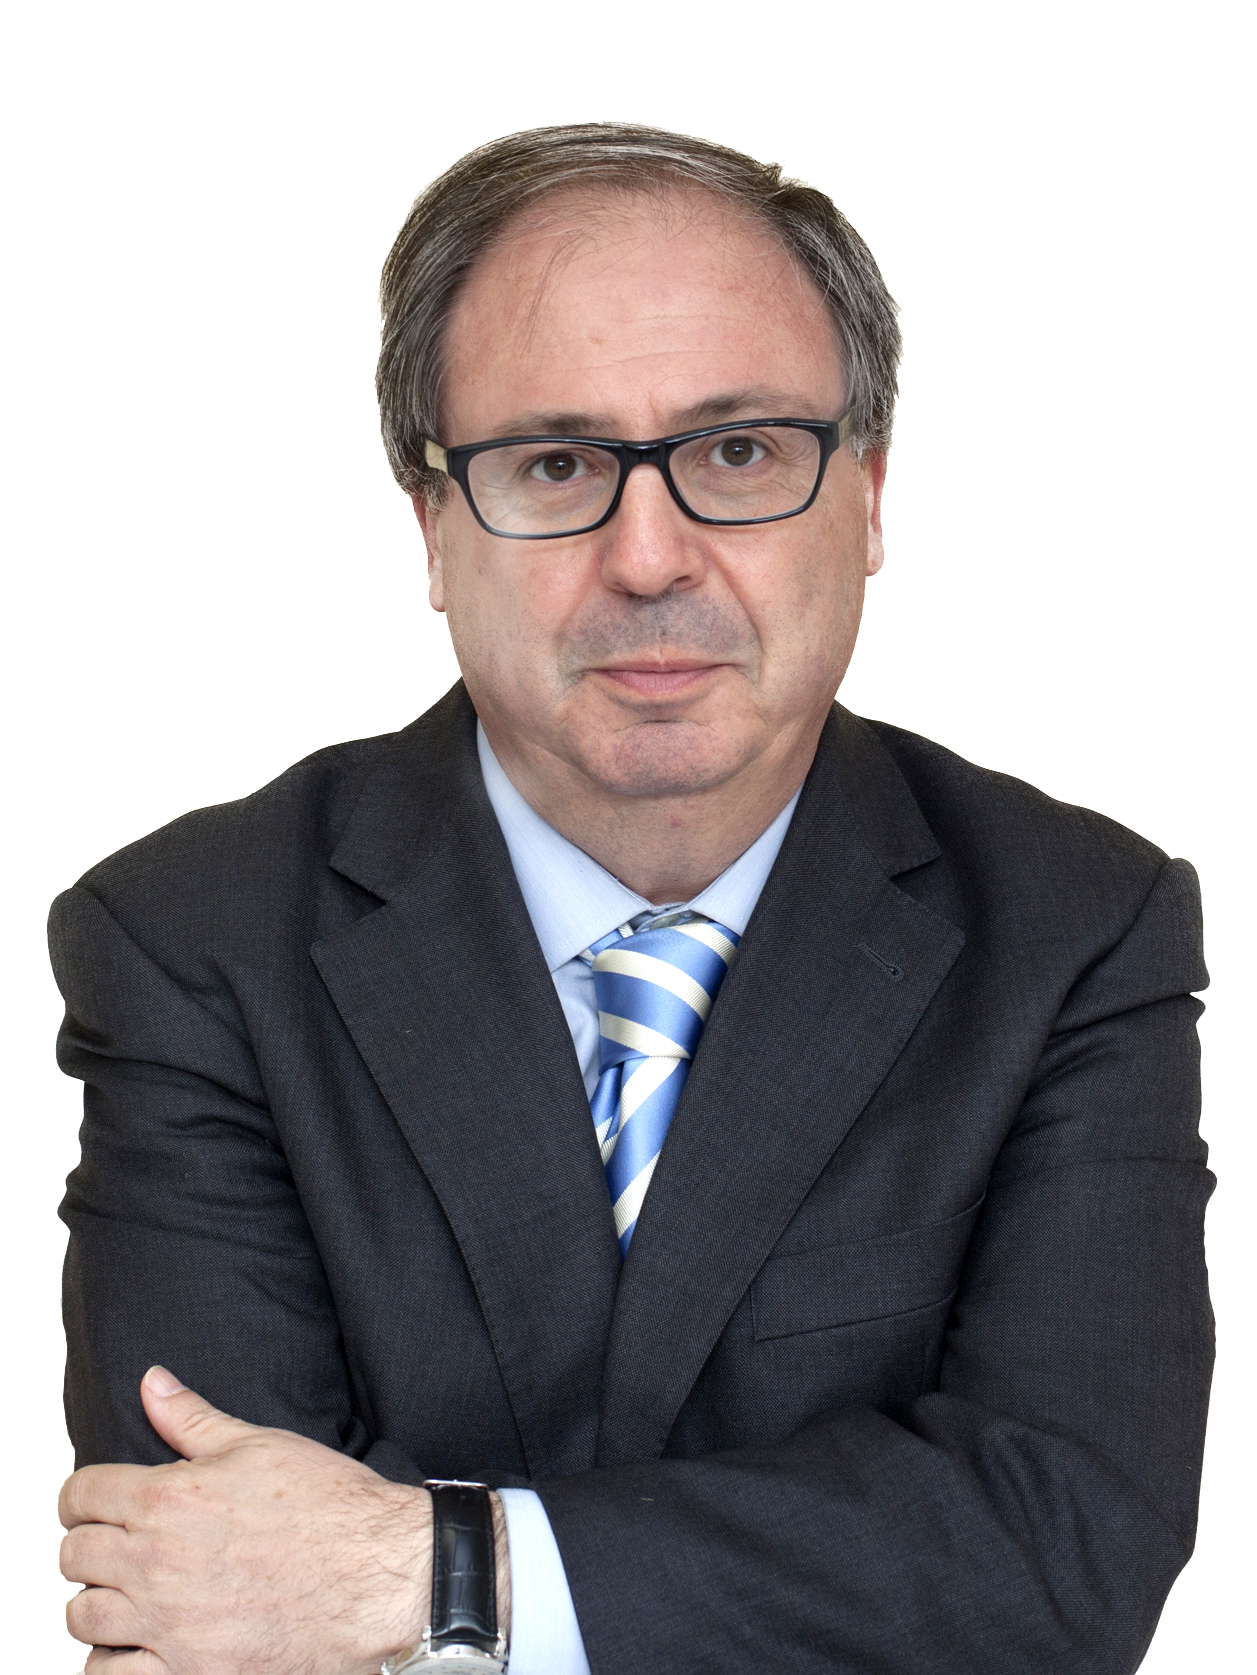 VICENTE ÁLVAREZ GARCÍA